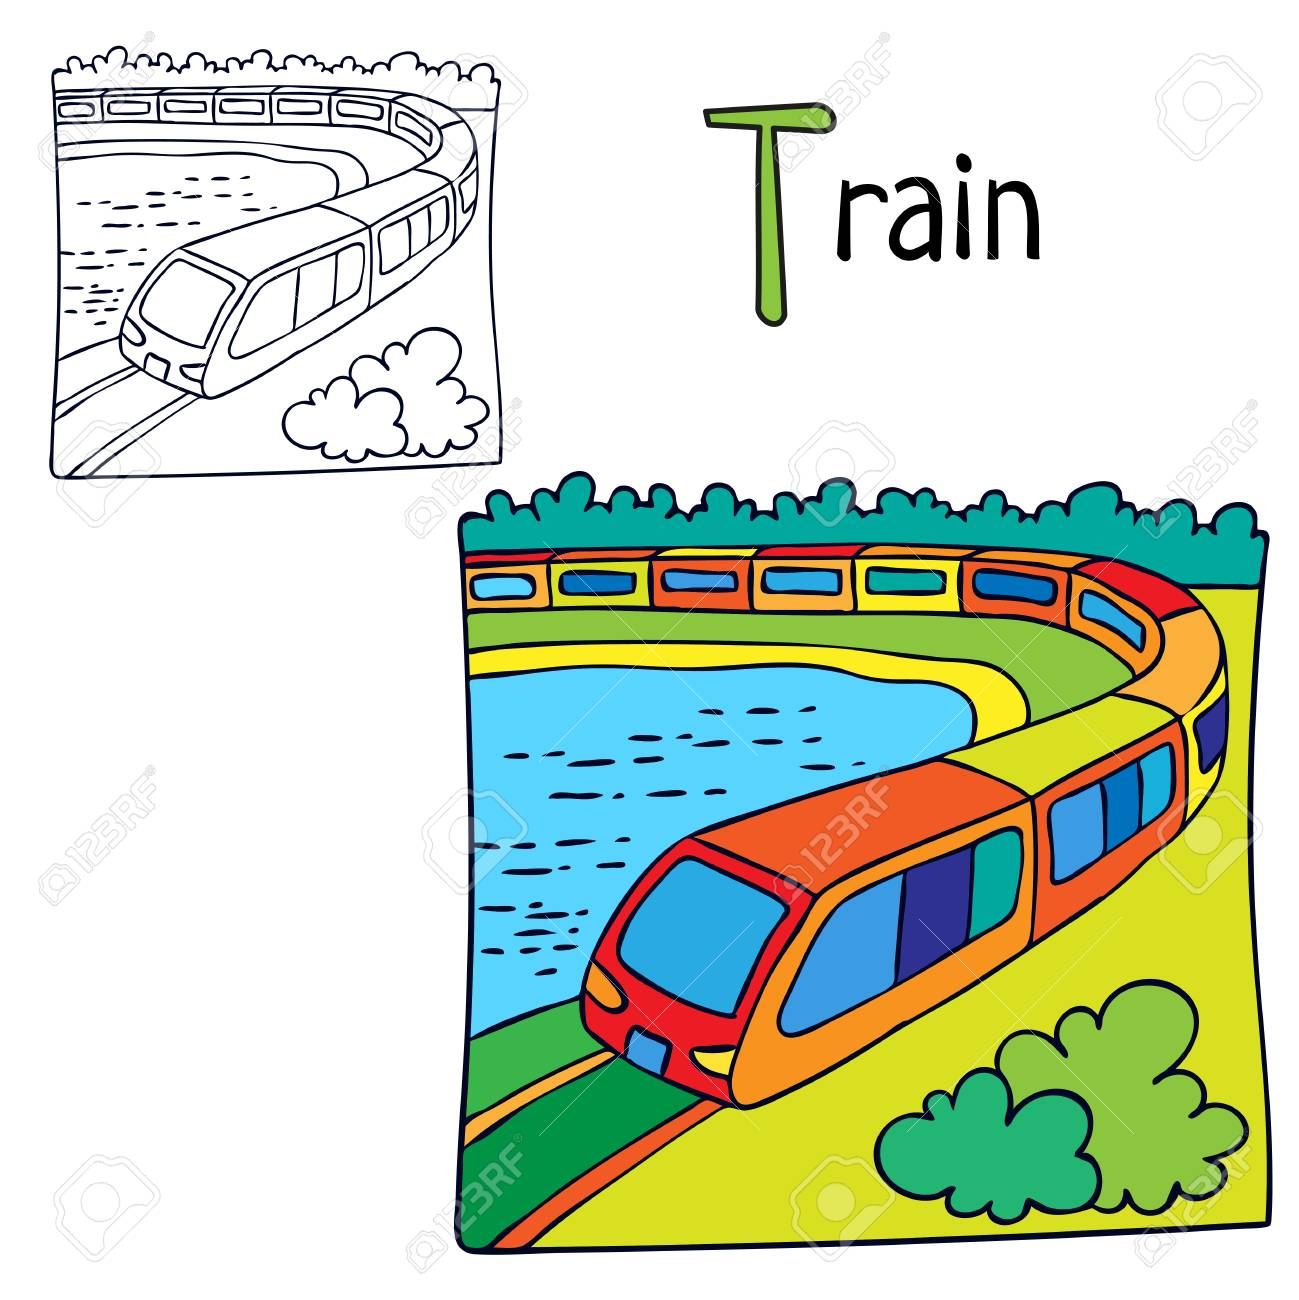 Train. Coloring Book Page. Cartoon Vector Illustration Royalty Free ...